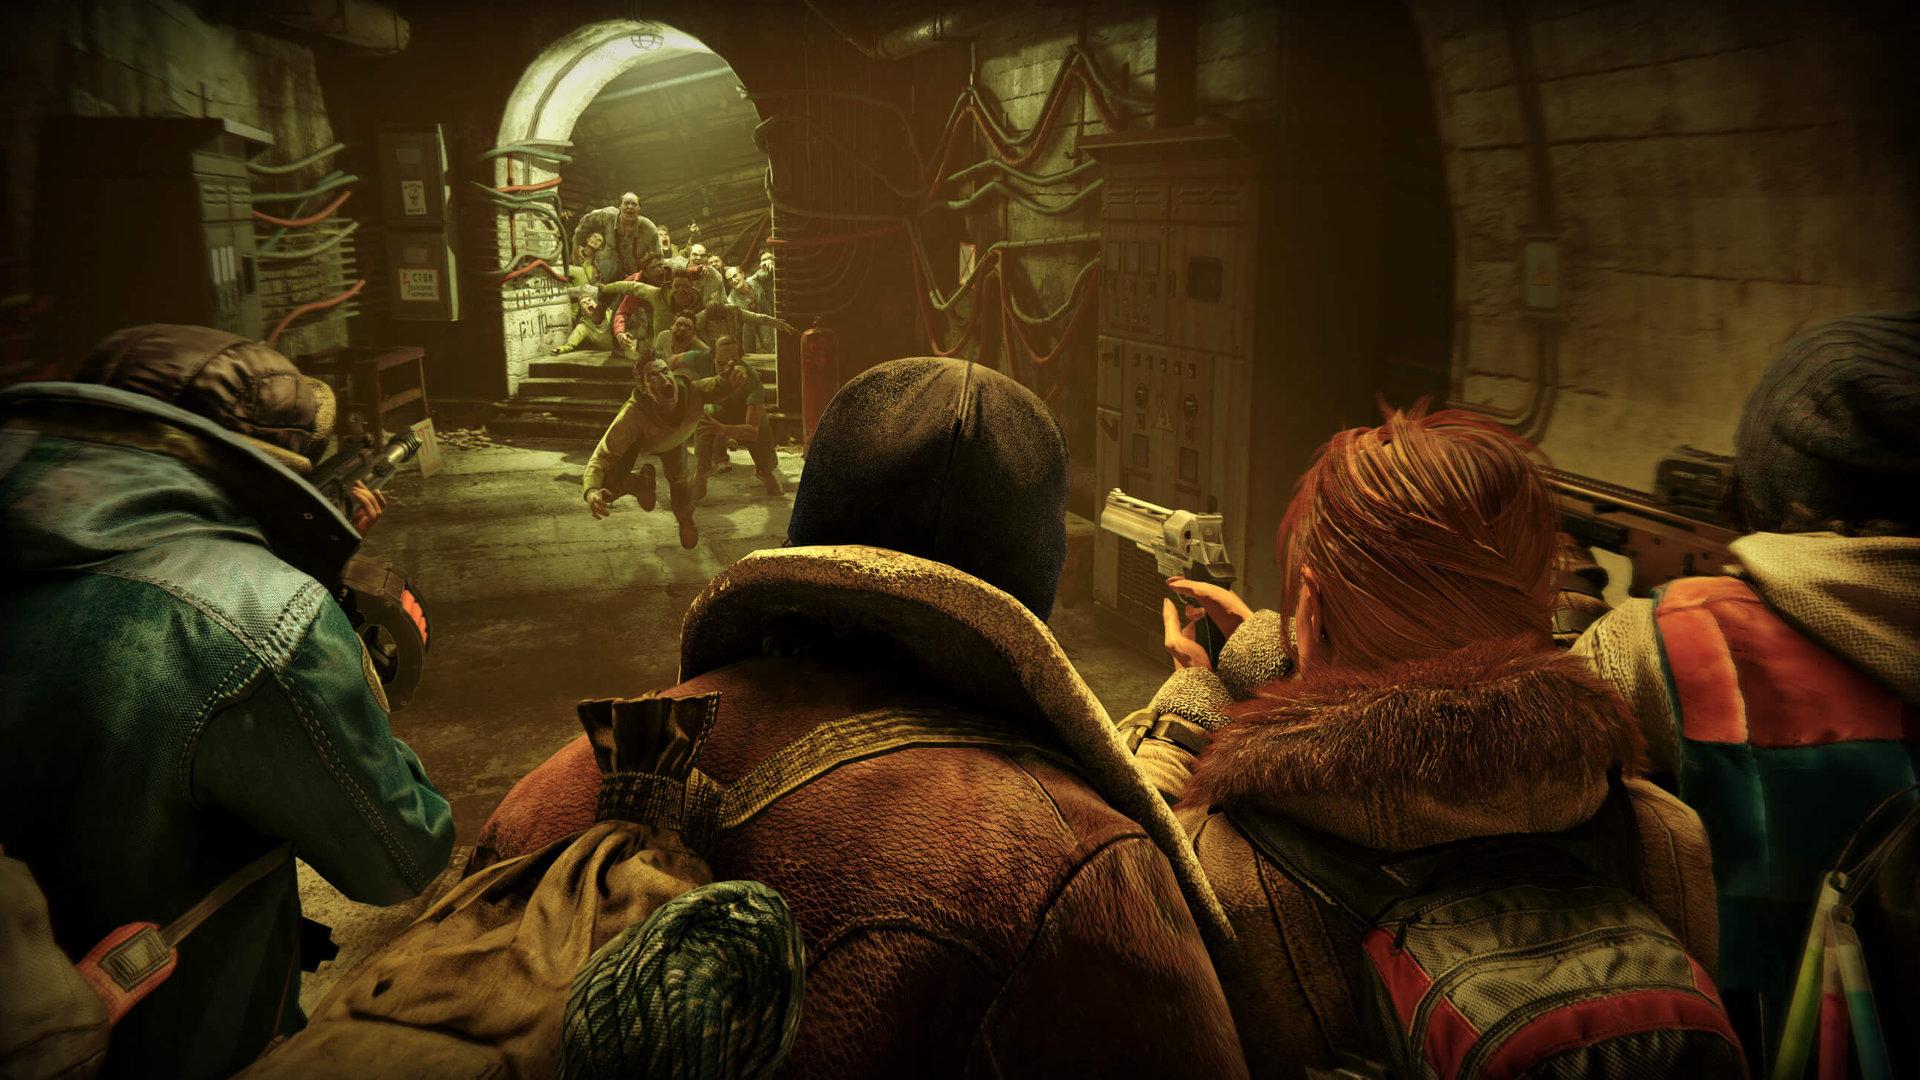 World War Z game released | Rock Paper Shotgun